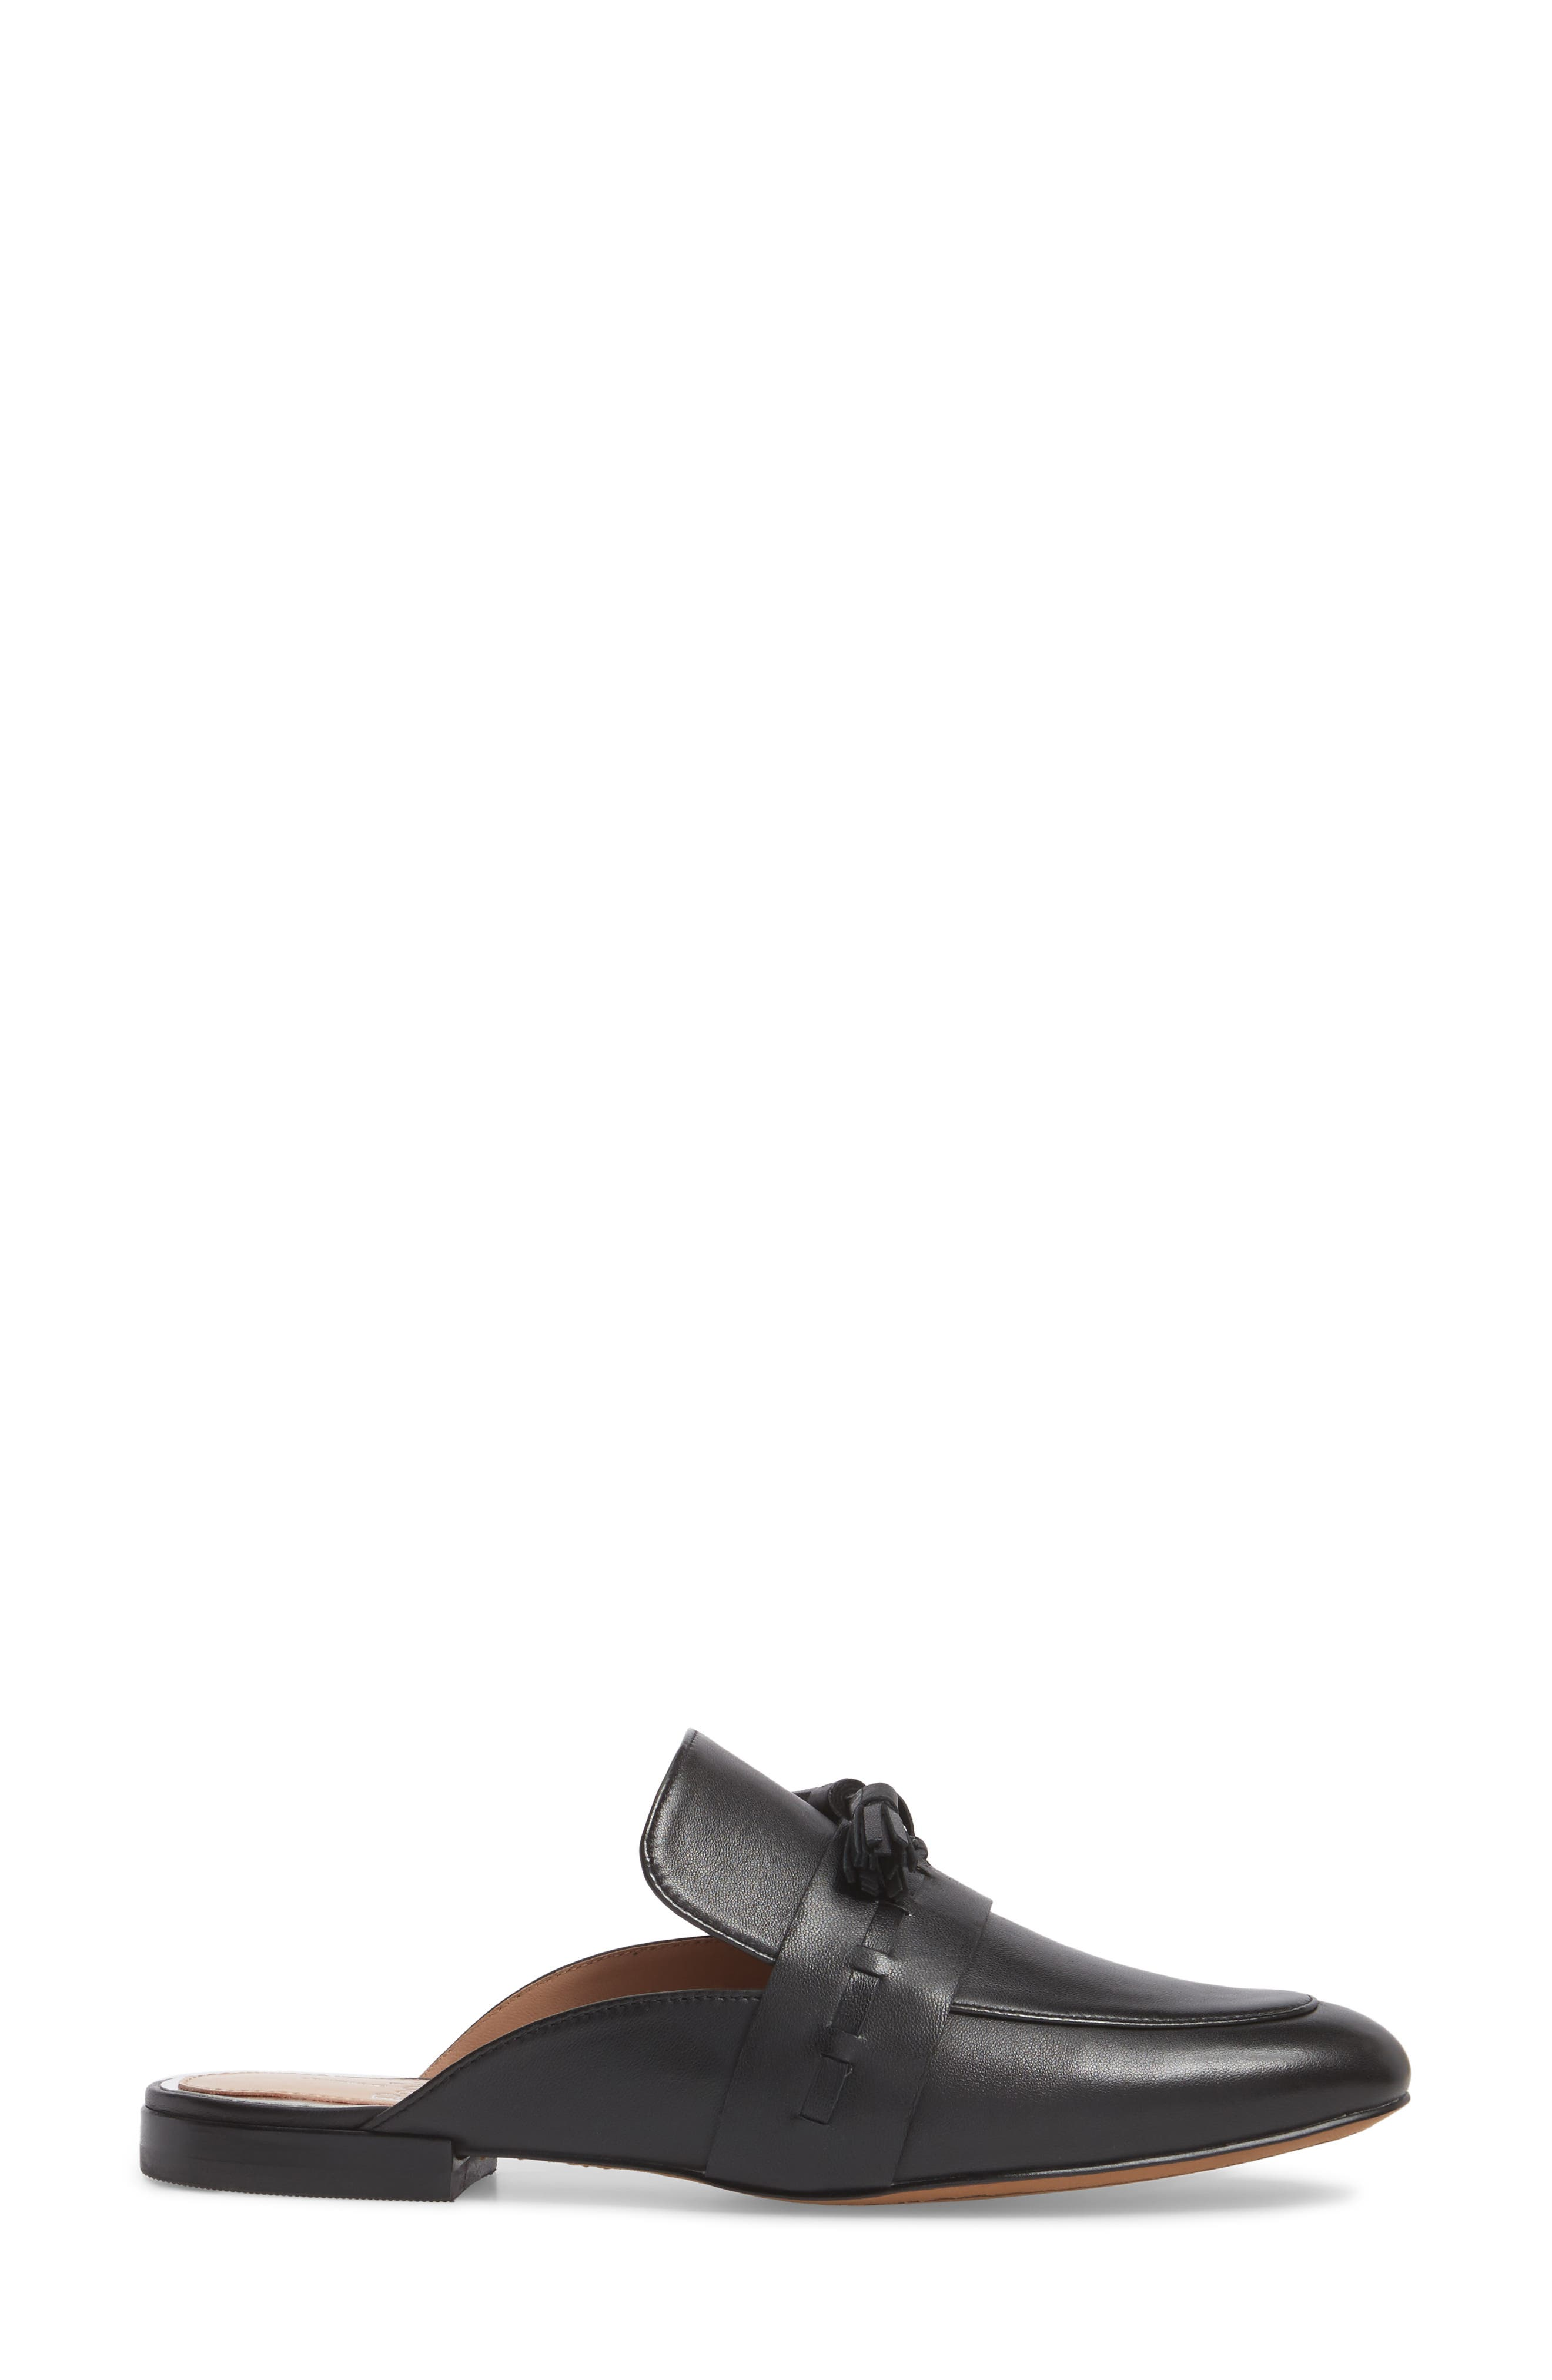 Abbot Tassel Mule,                             Alternate thumbnail 3, color,                             Black Leather